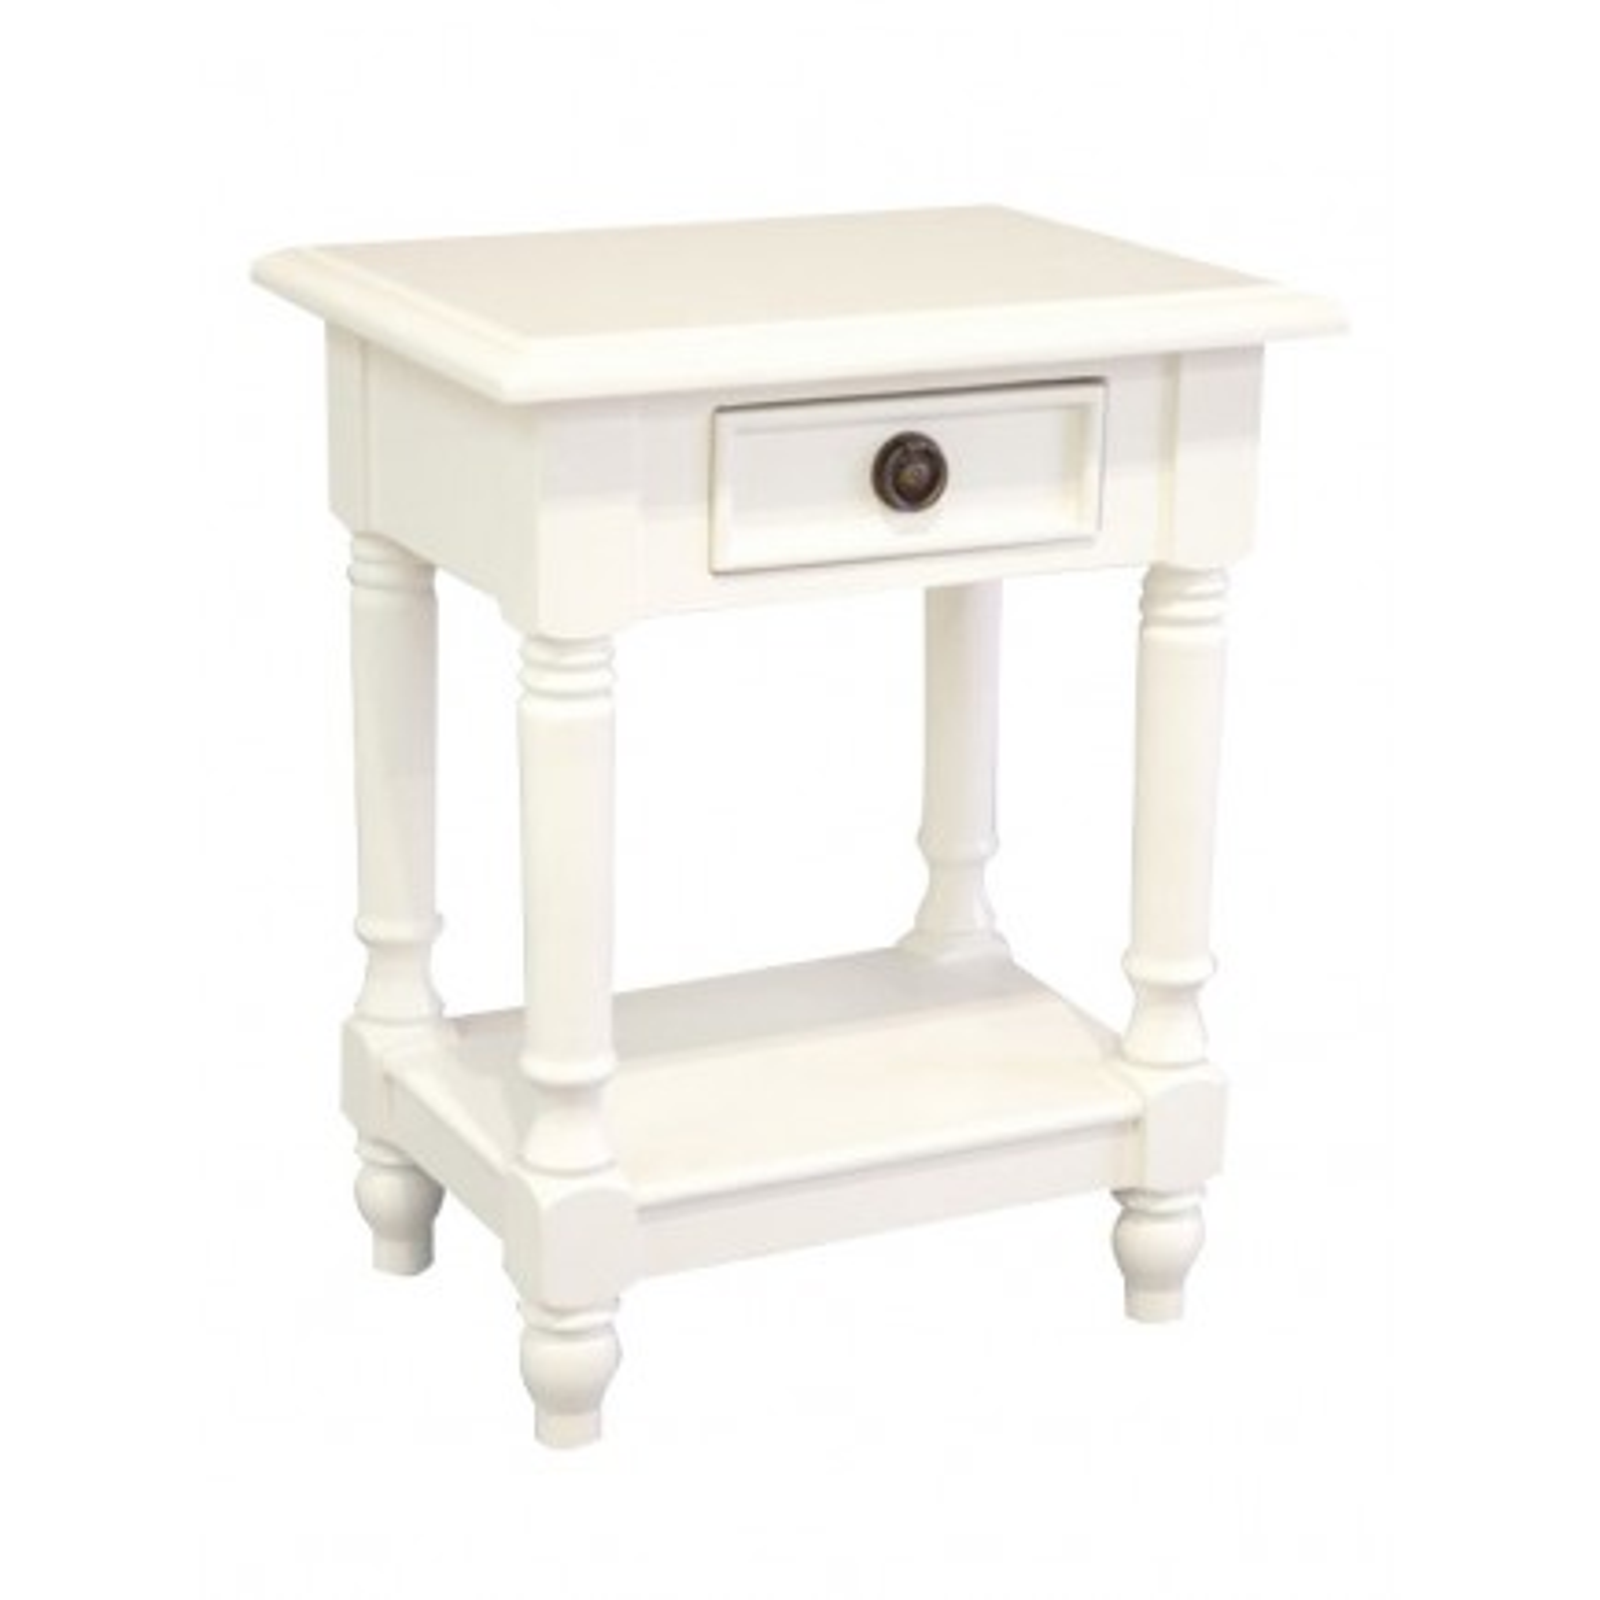 Chevet Charme Hévéa - meuble style classique